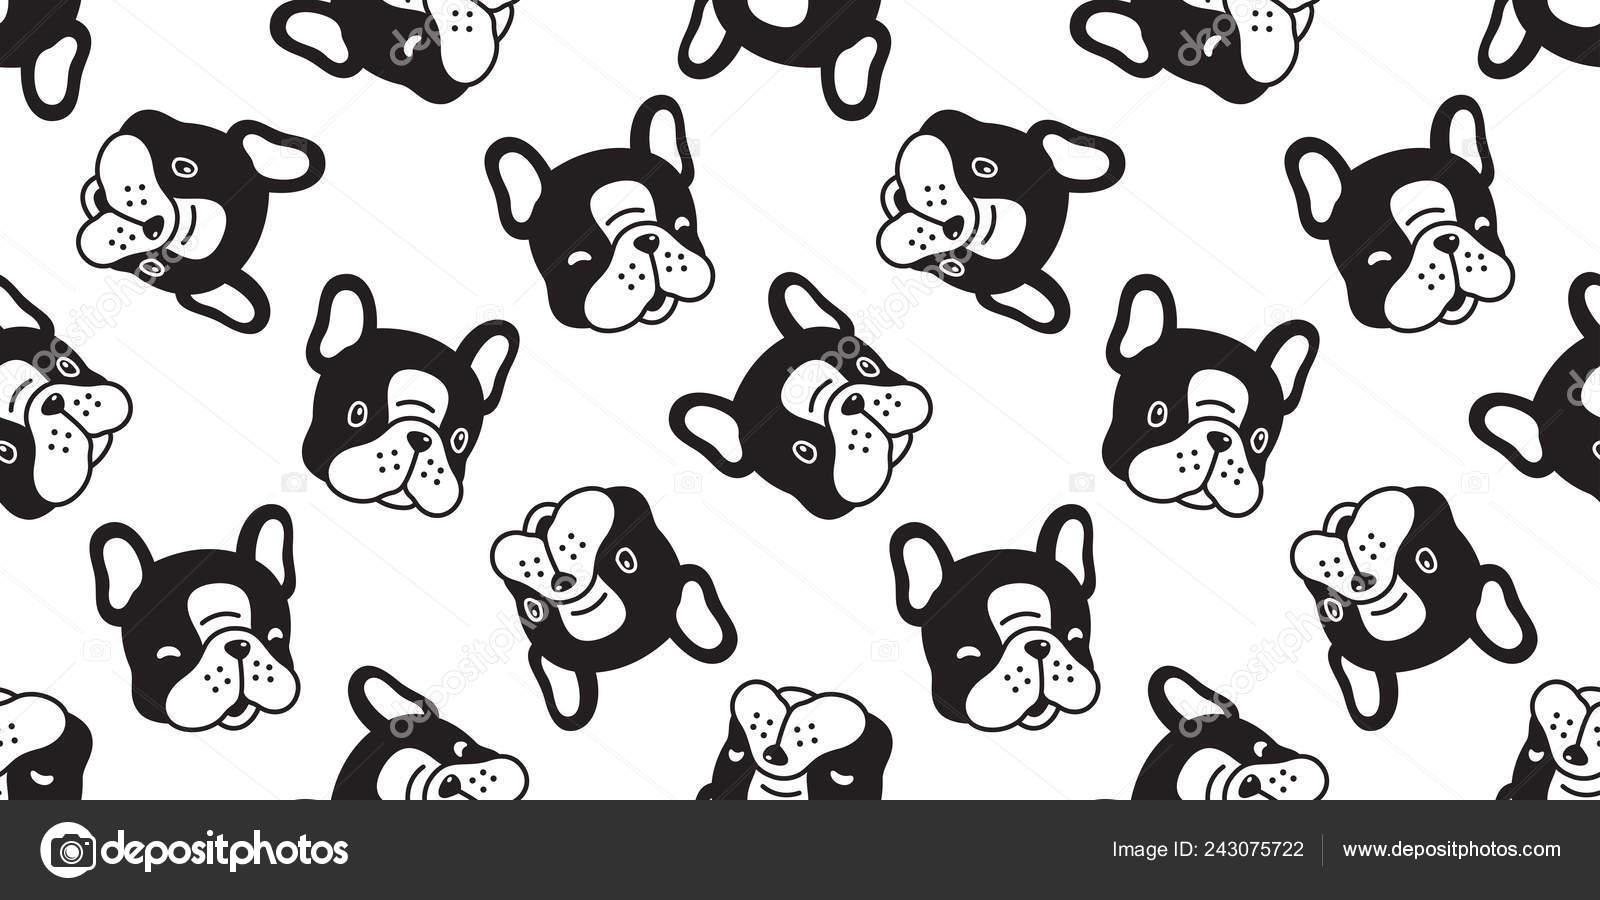 Dog Seamless Pattern French Bulldog Vector Scarf Isolated Cartoon Repeat Stock Vector C Cnuisin 243075722